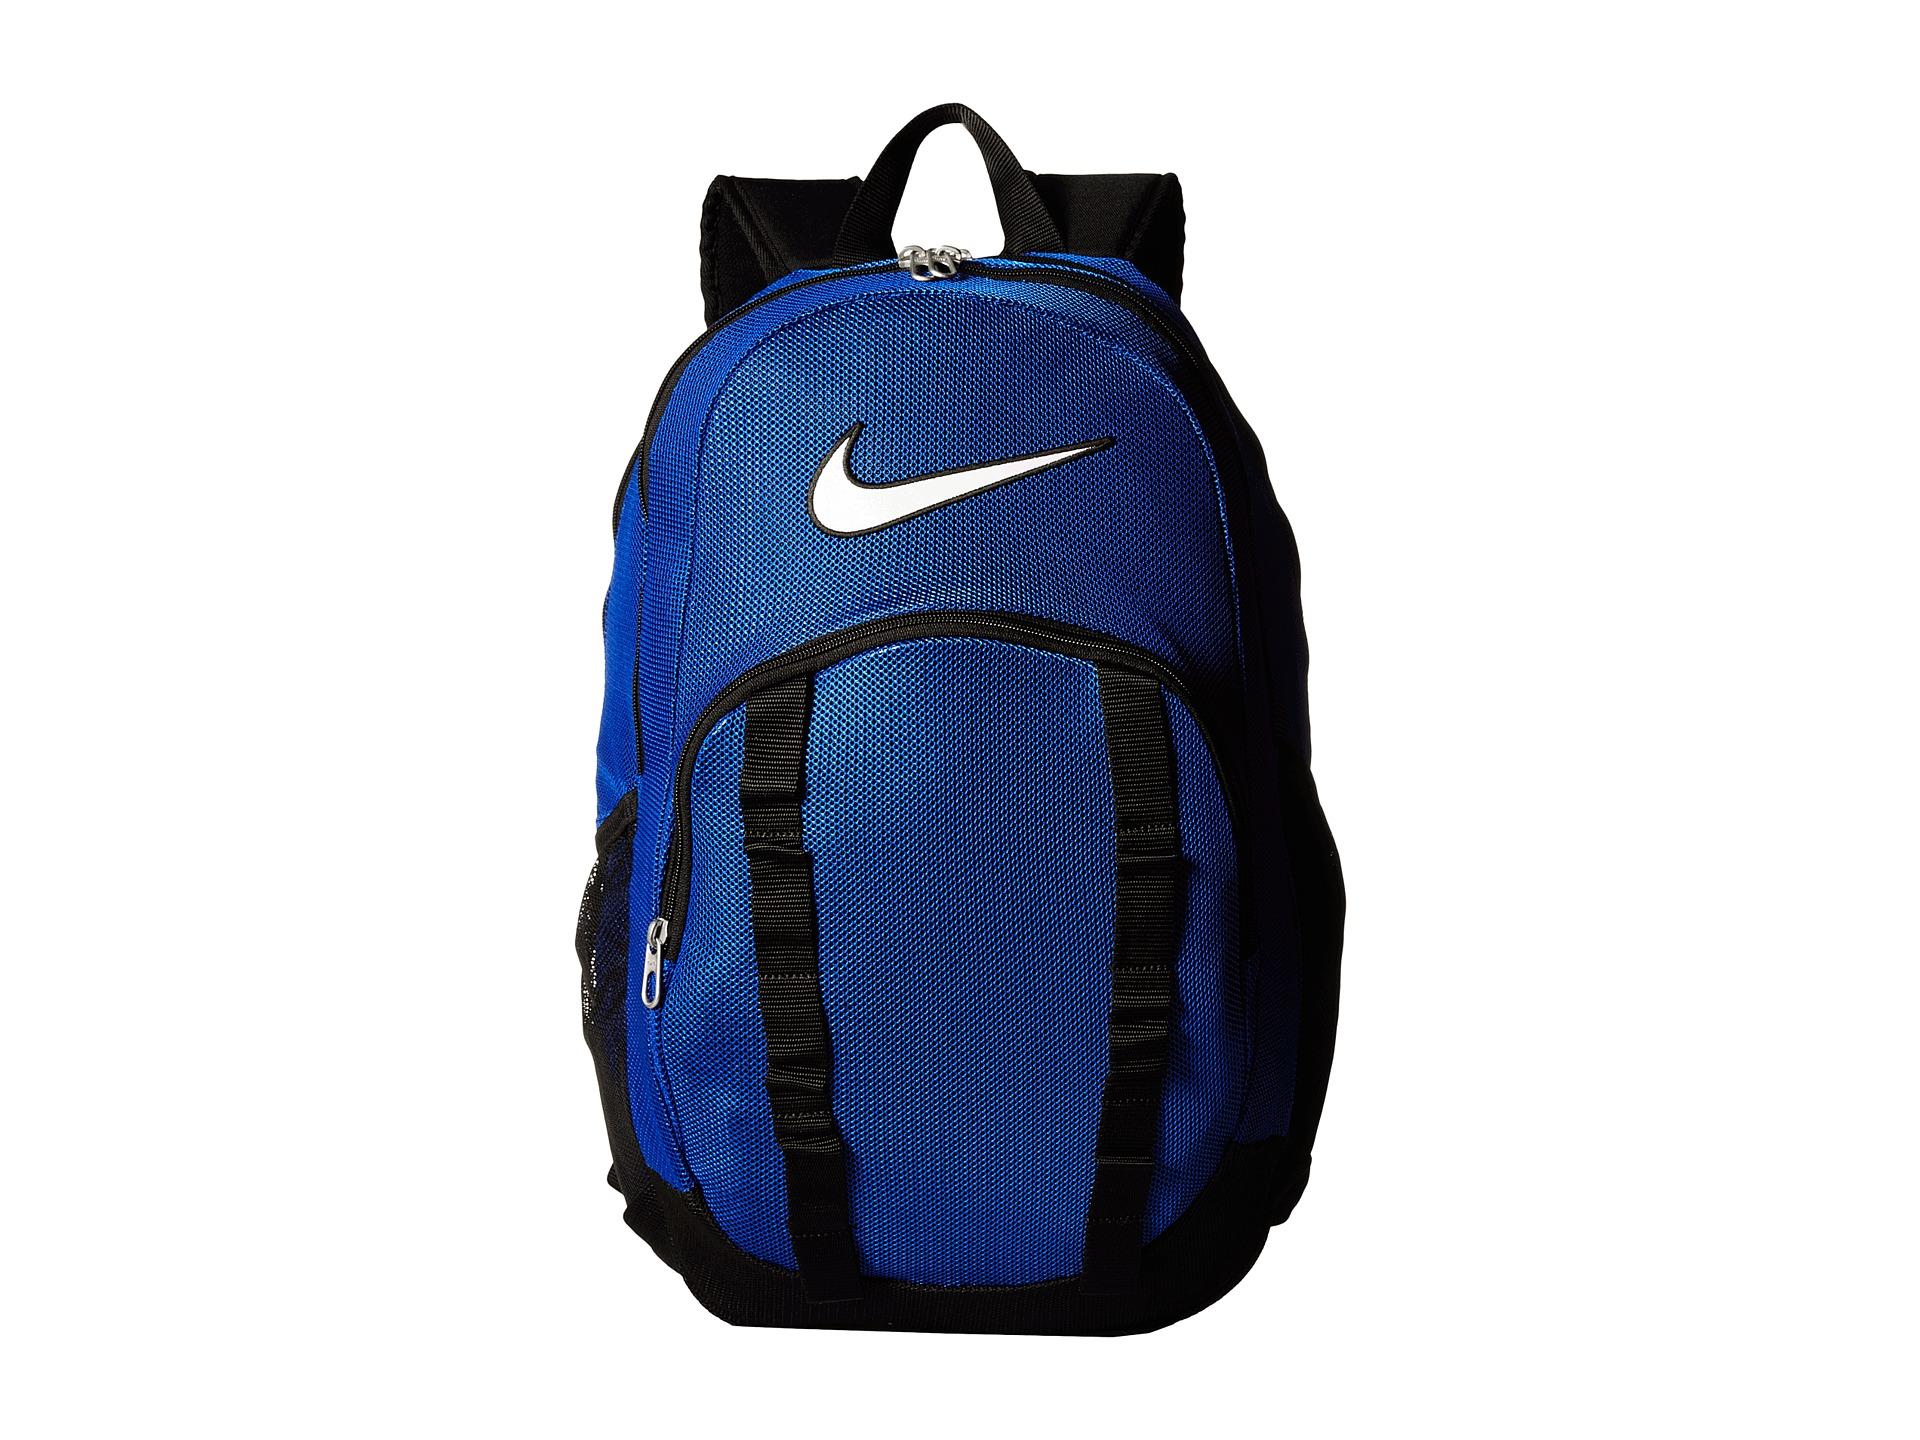 f68f87b9fffb jordan mesh backpack cheap   OFF73% The Largest Catalog Discounts